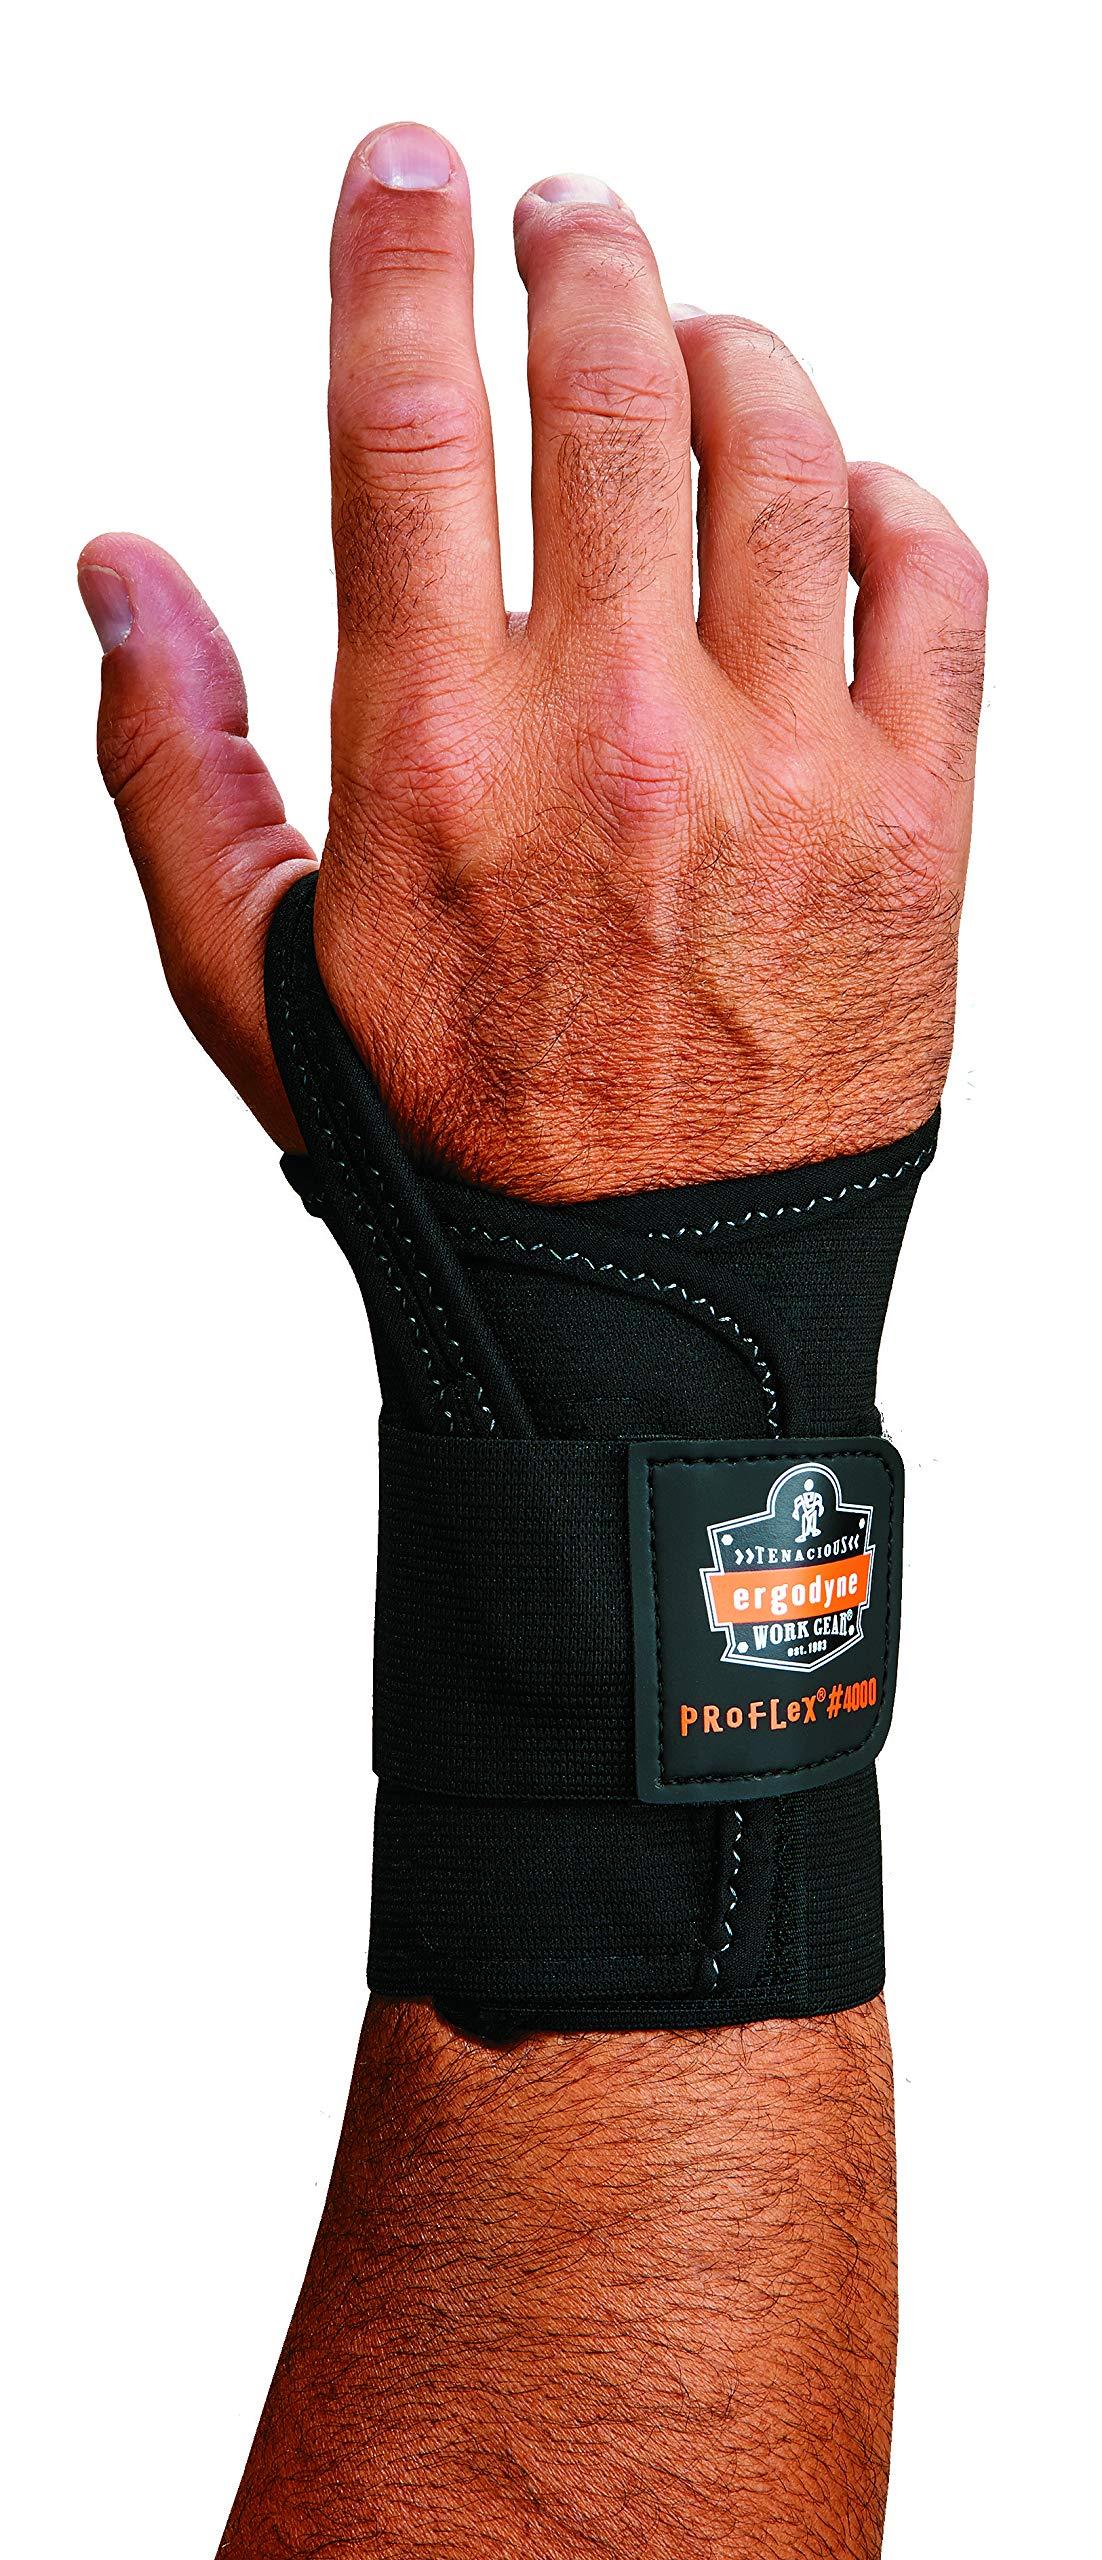 Ergodyne ProFlex 4000 Single Strap Wrist Support, Black - Large, Right Hand